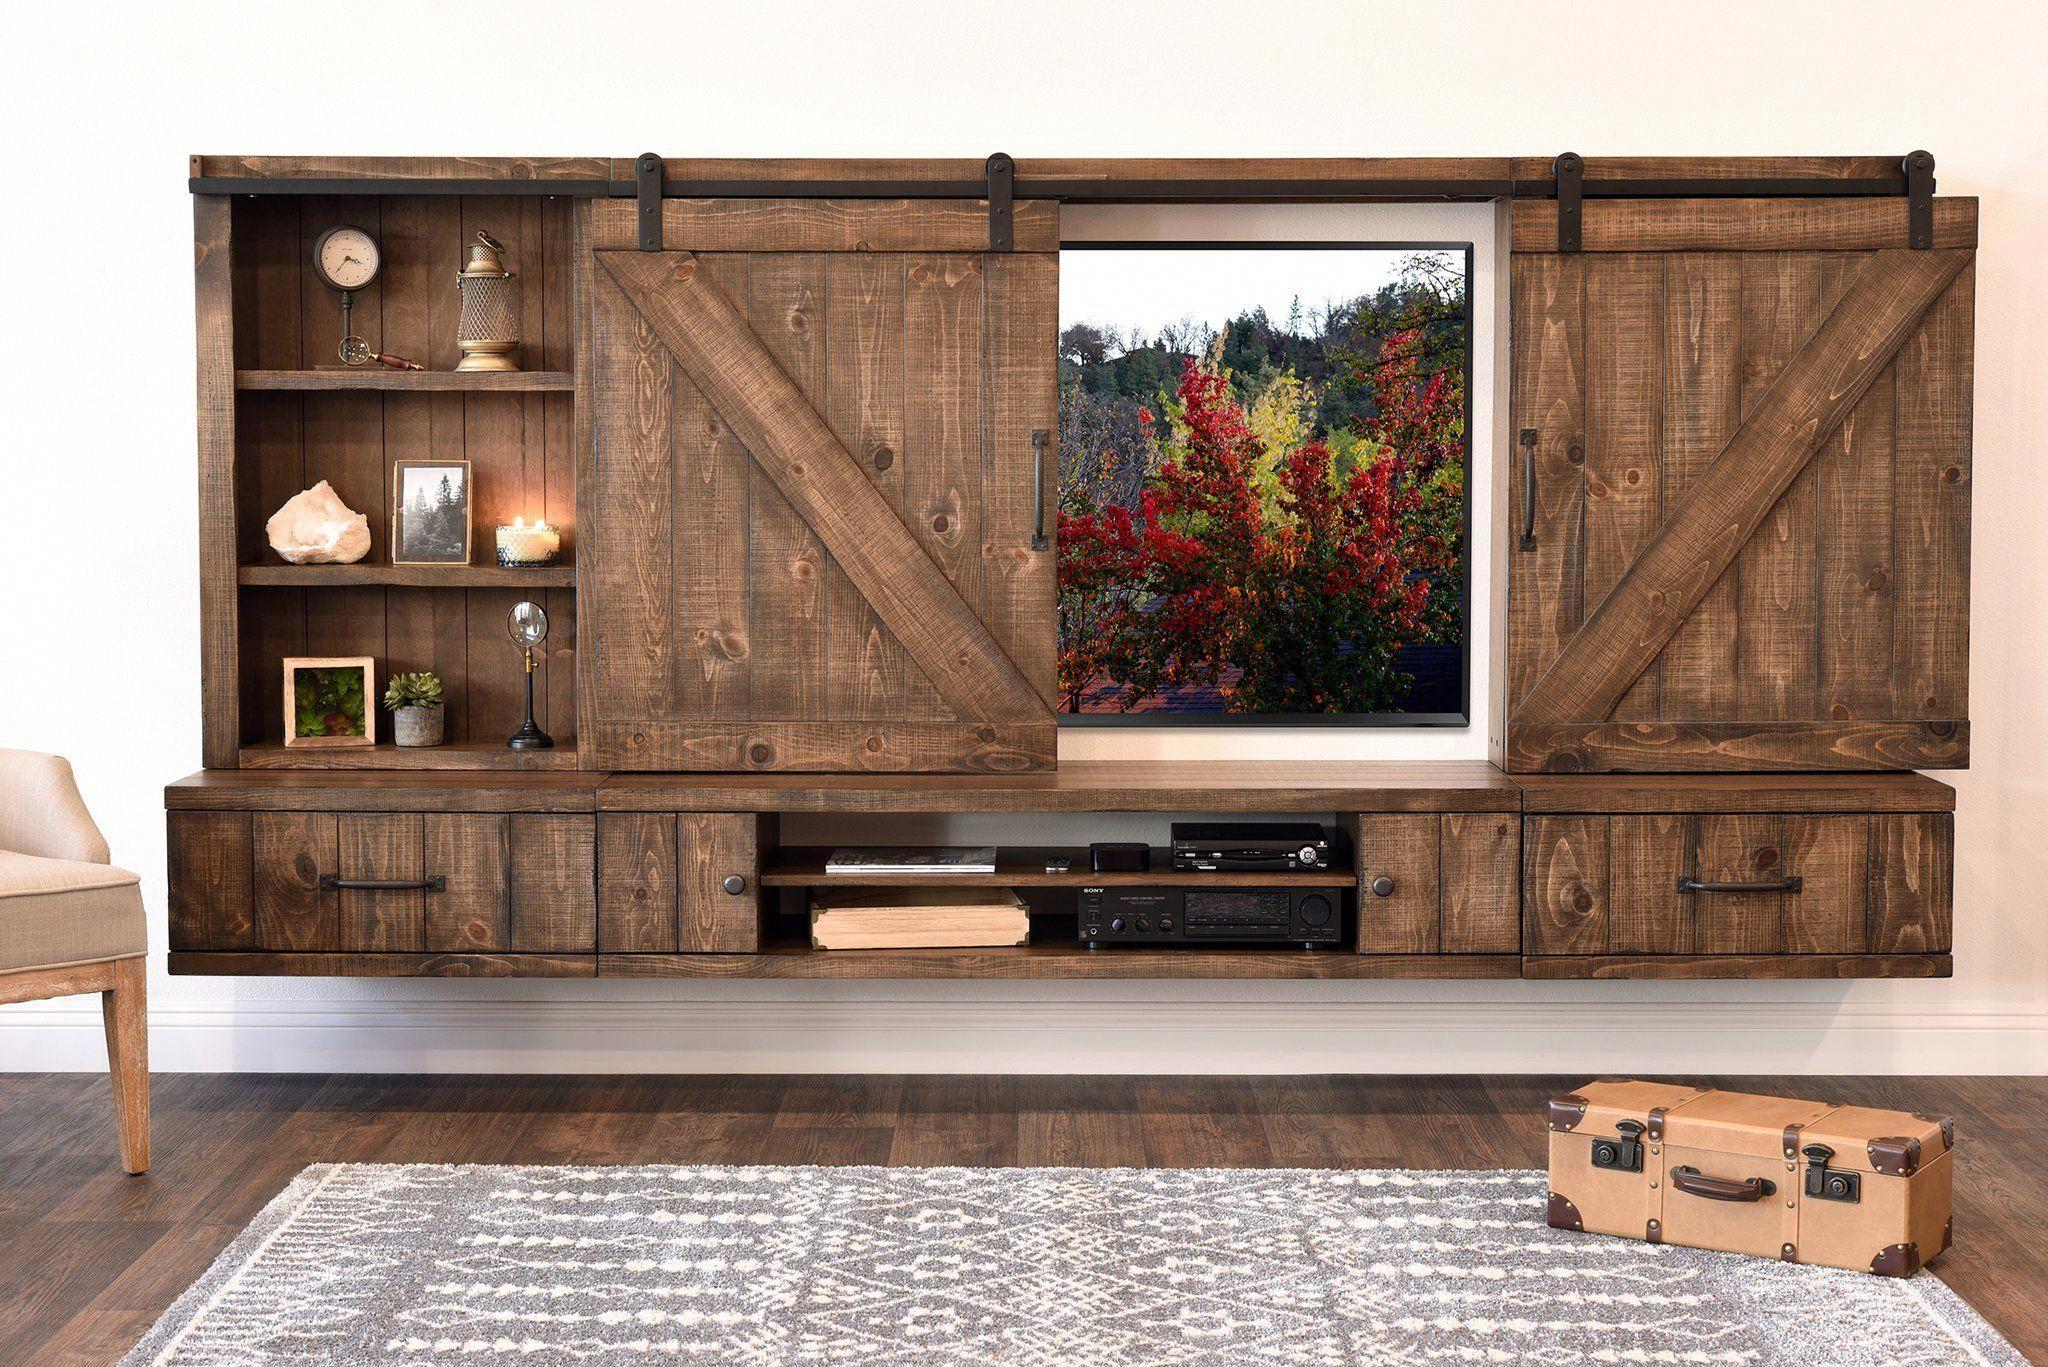 Farmhouse barn door entertainment center floating tv